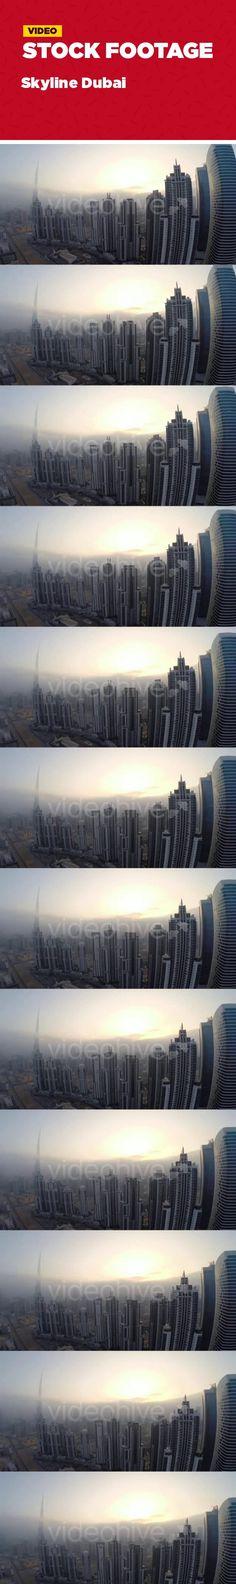 buildings, burj, burj khalifa, city, city skyline, cityscape, dubai, Dubai skyline, flying, high altitude, skyline, skyscraper, skyscrapers, towers Sunset in Dubai with View over Skyline, while the Burj is breaking through a cloud